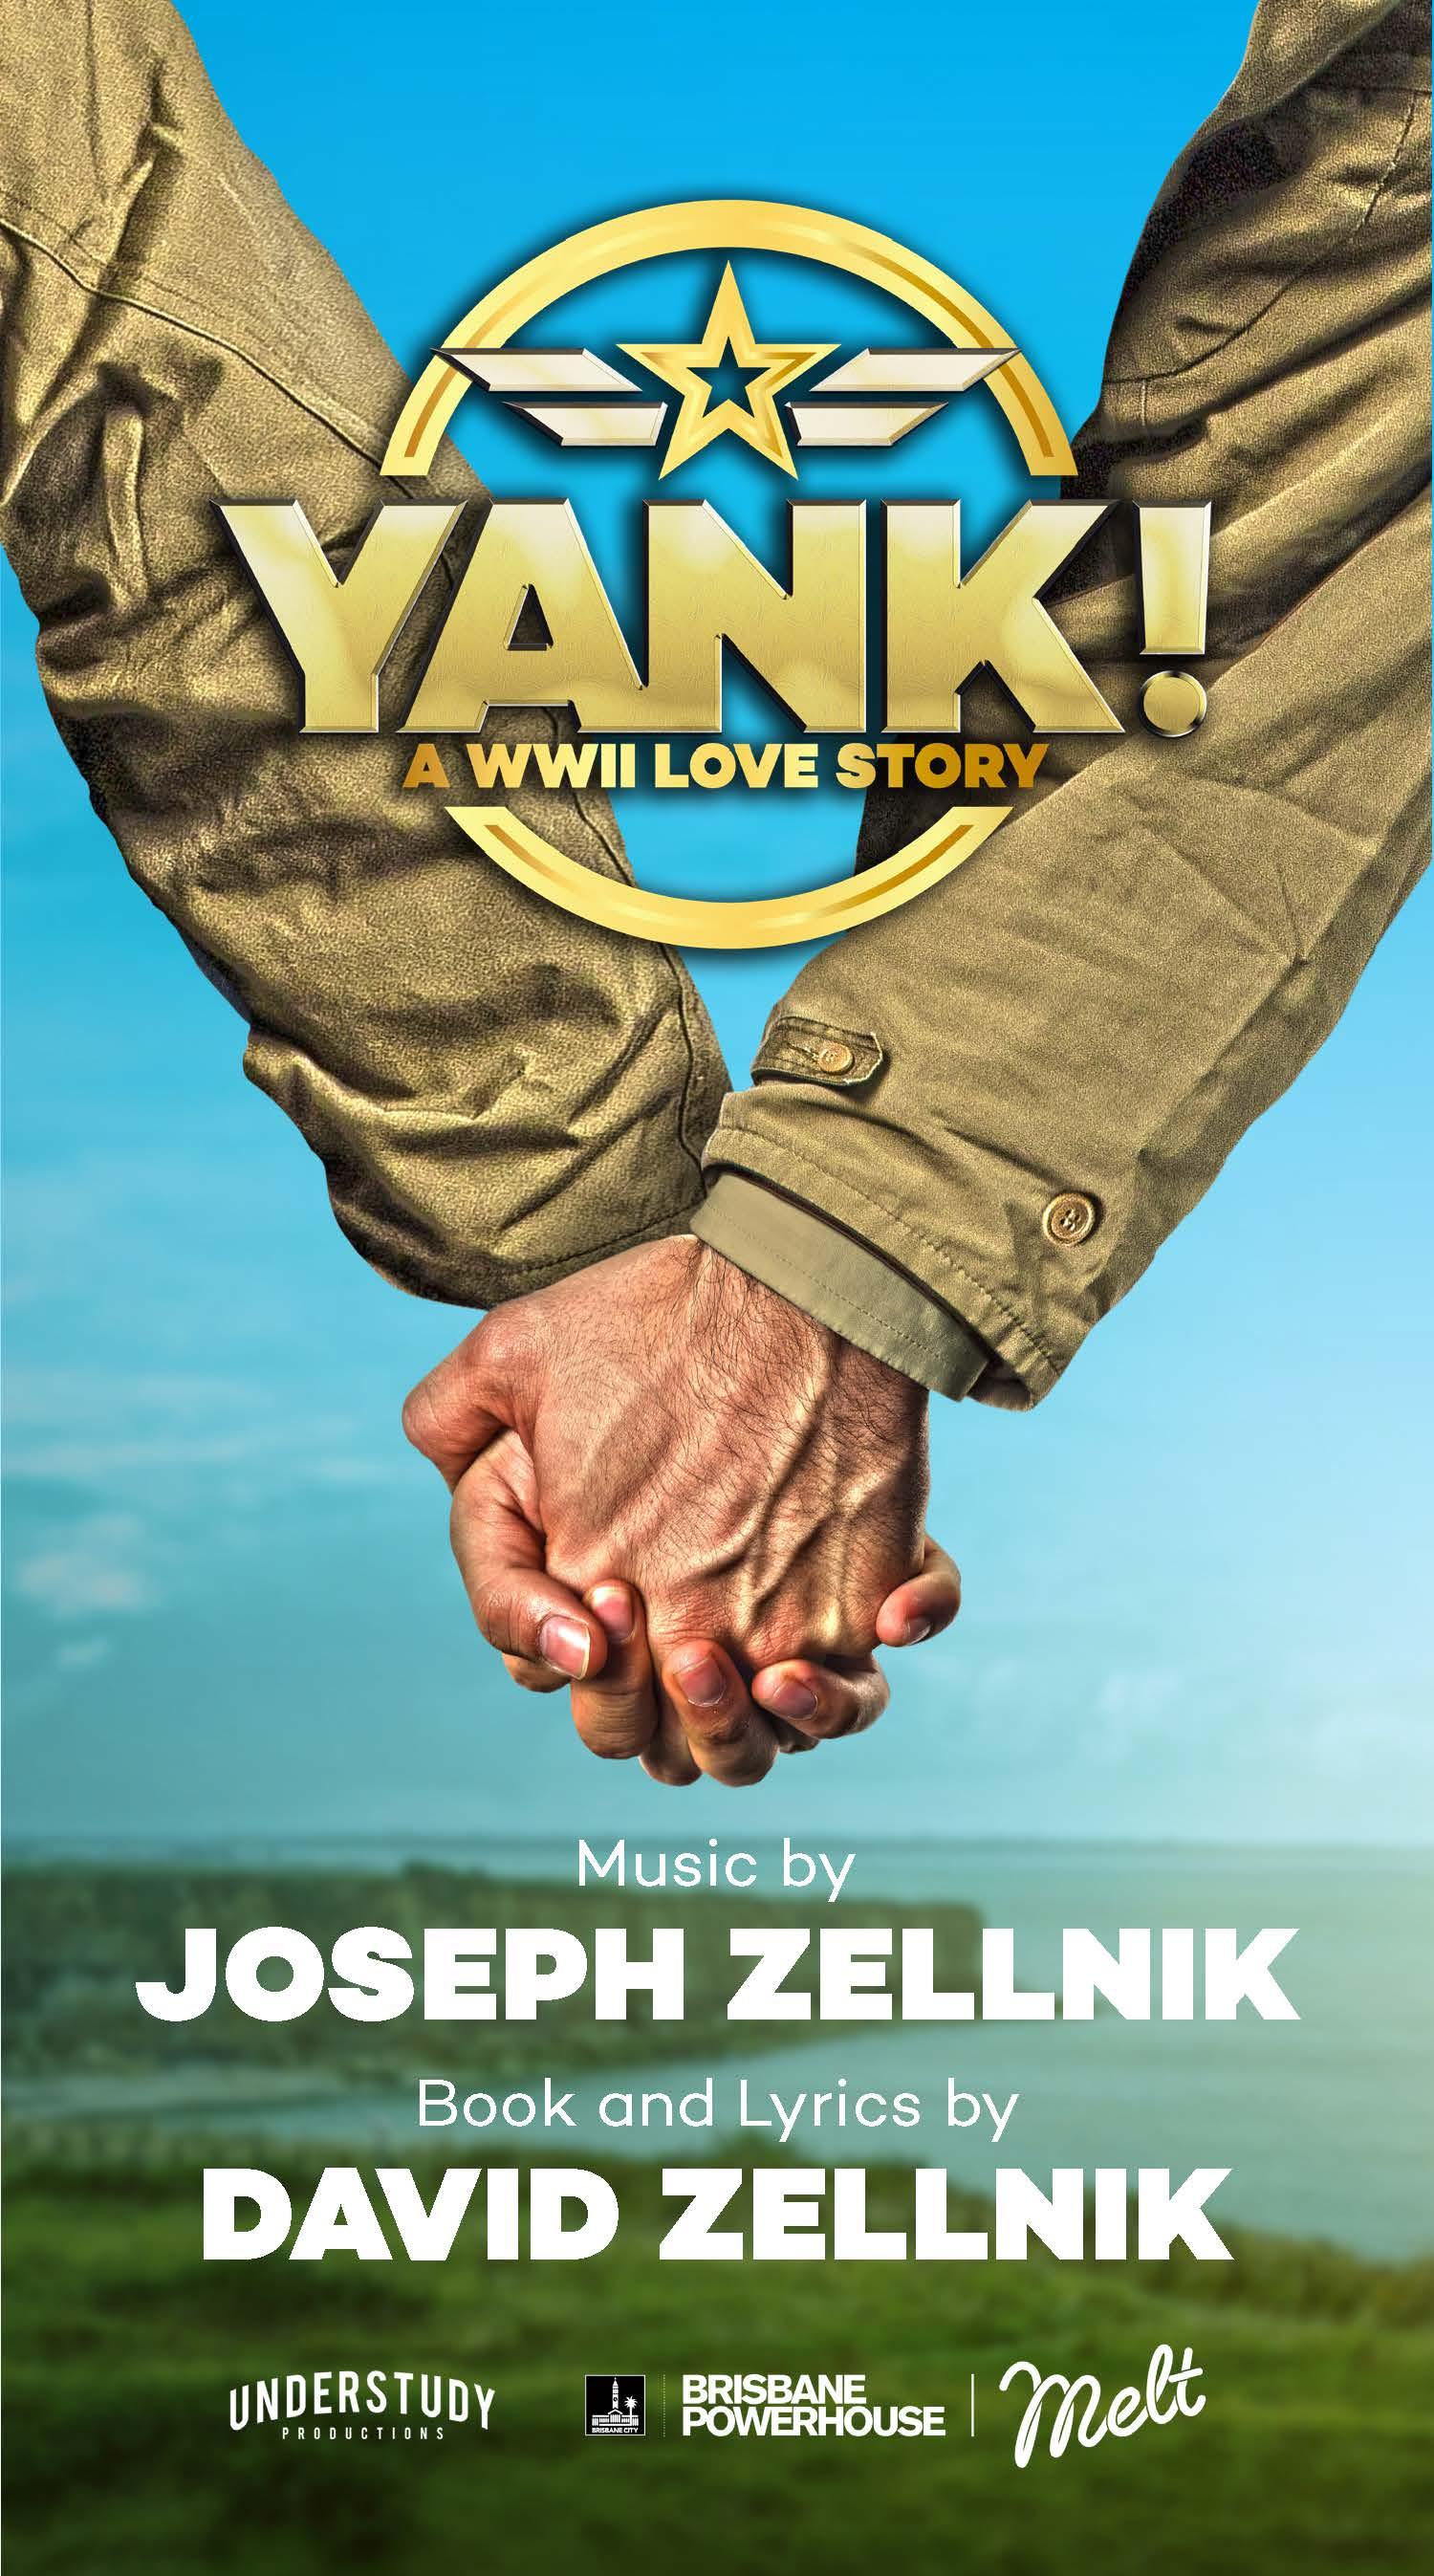 Yank_Page_1.jpg